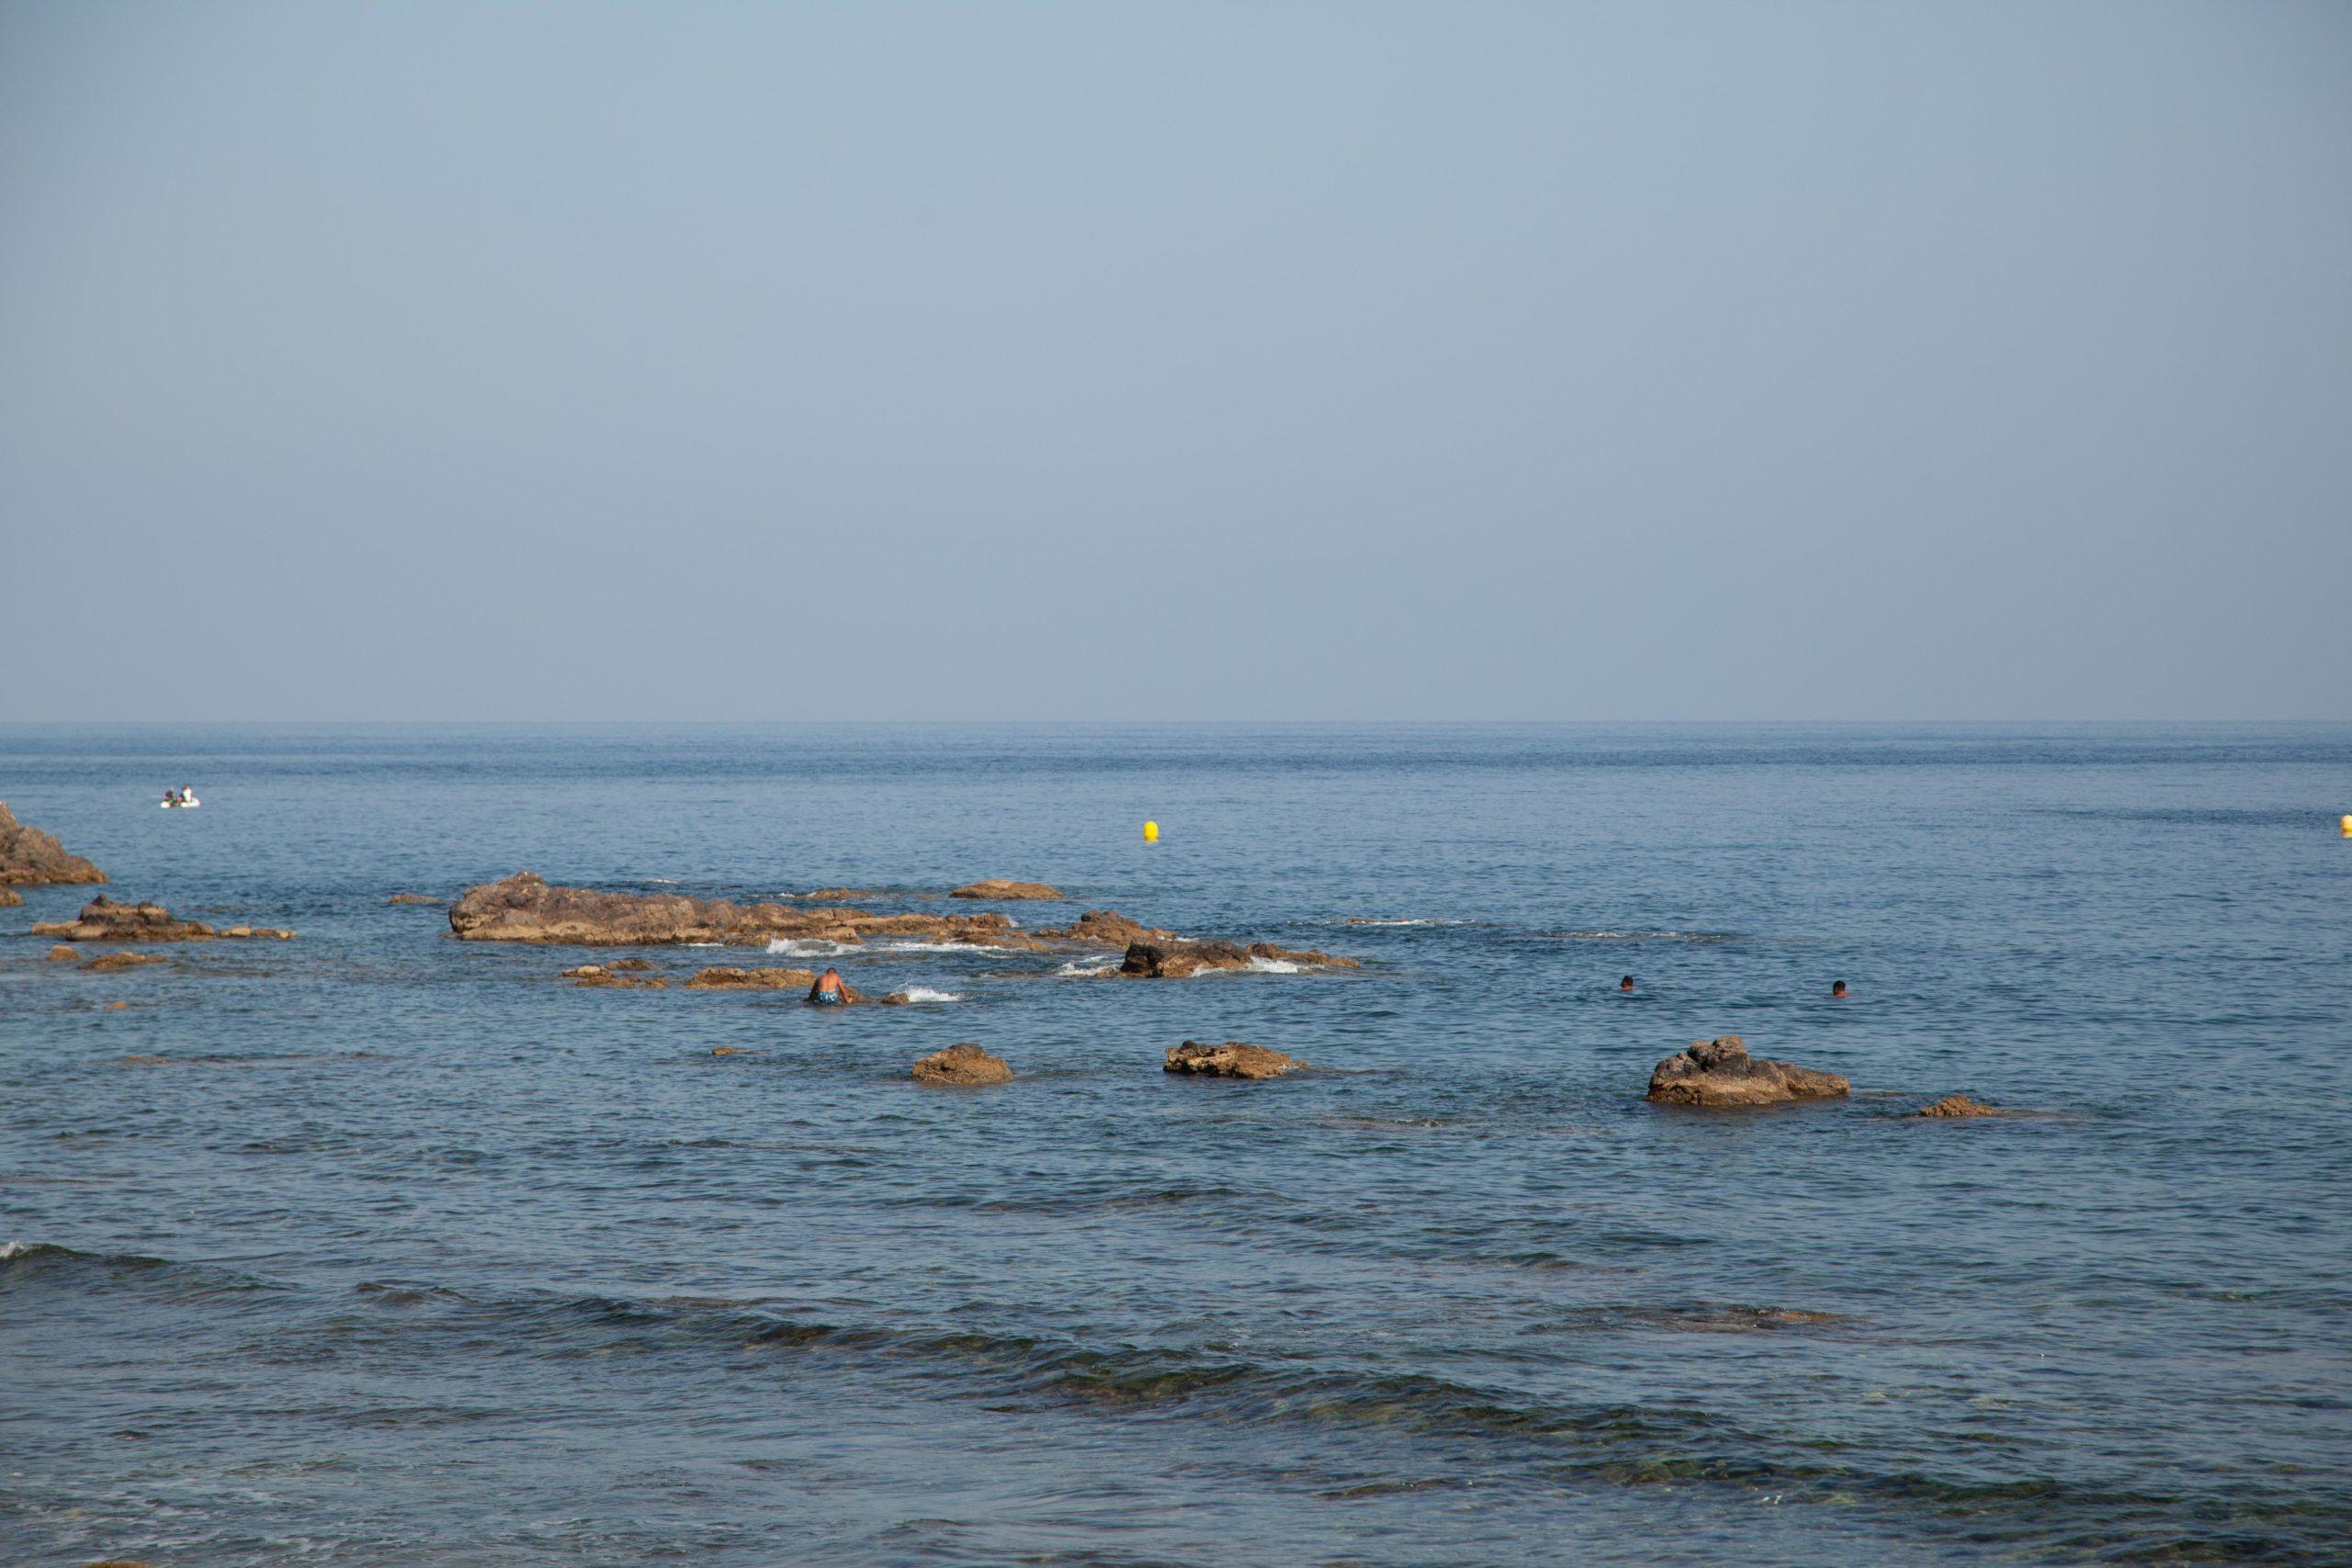 canal nado aguas abiertas